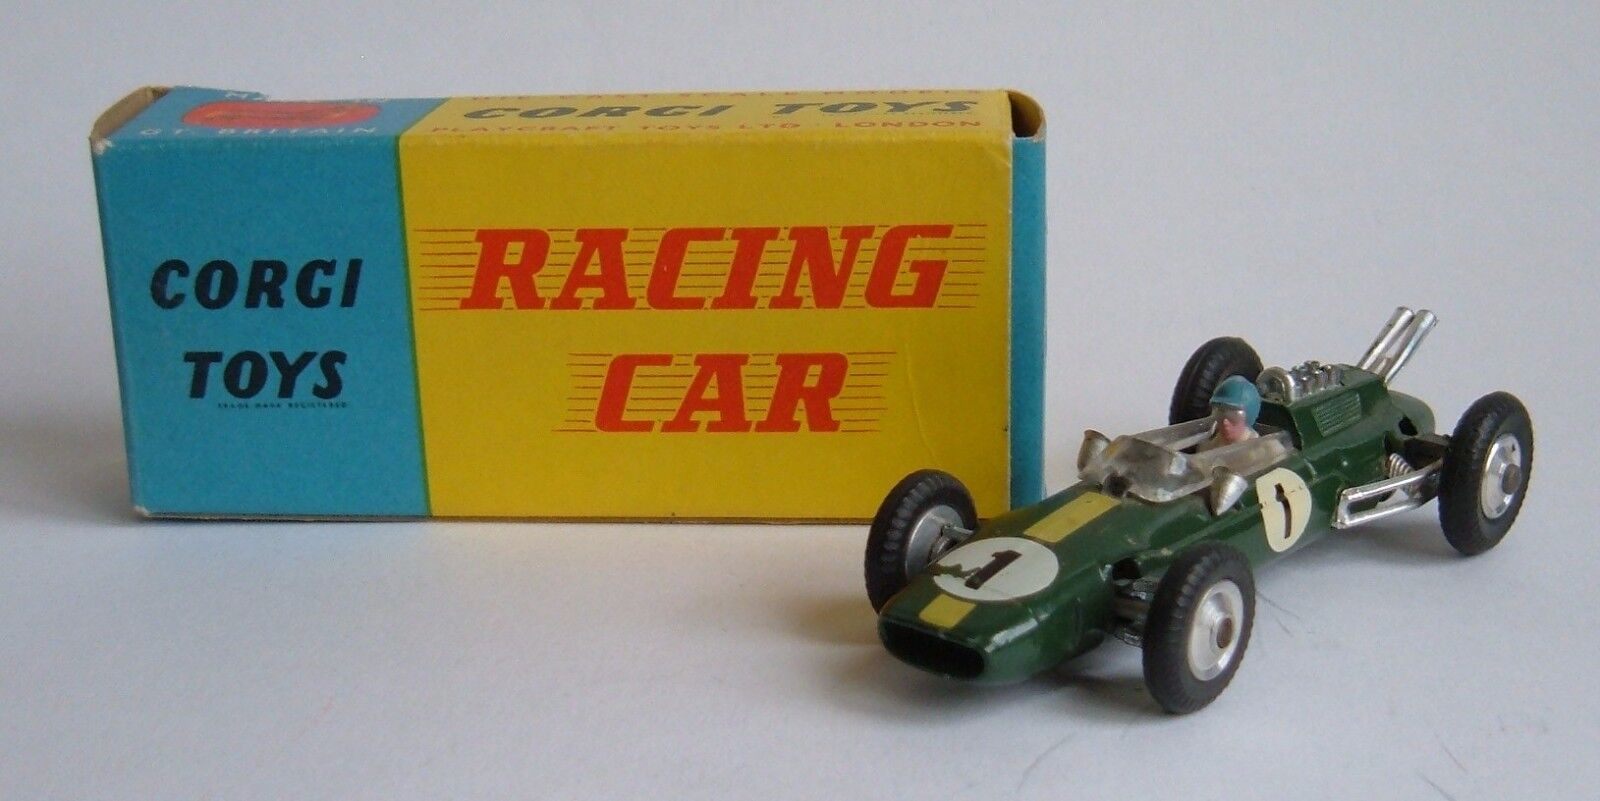 Corgi Toys No. 155, Lotus-Climax F1 Racing Car, - Superb